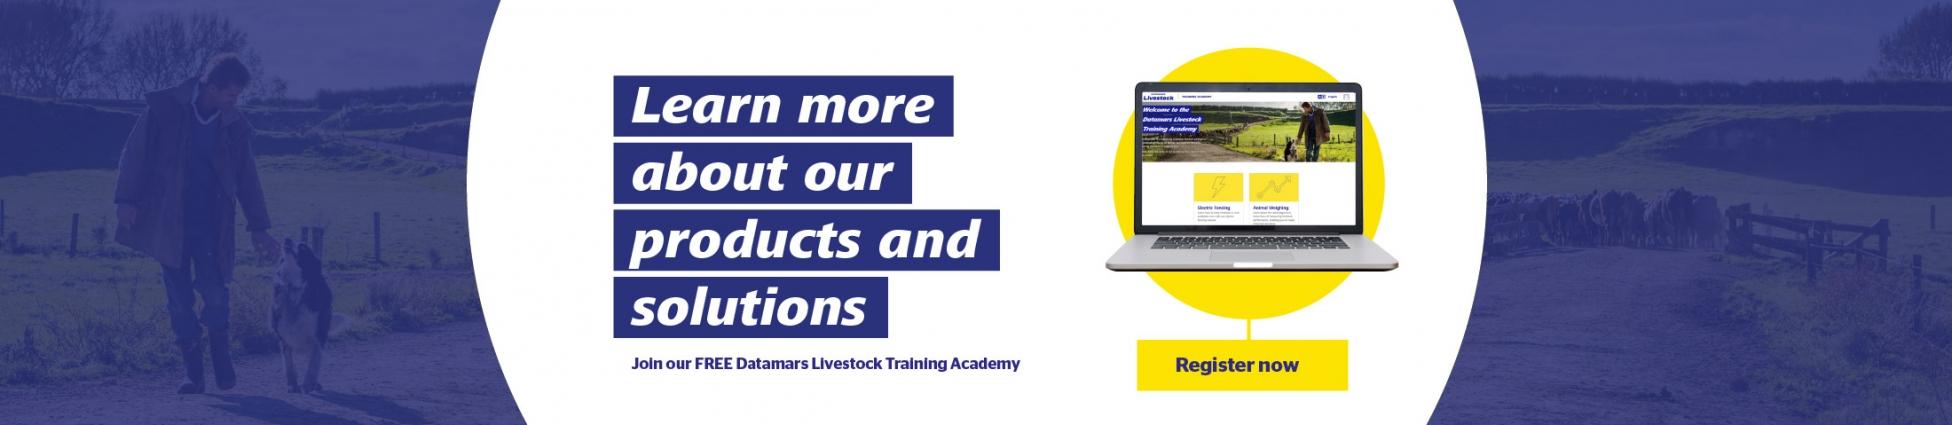 Go to Datamars Training Academy